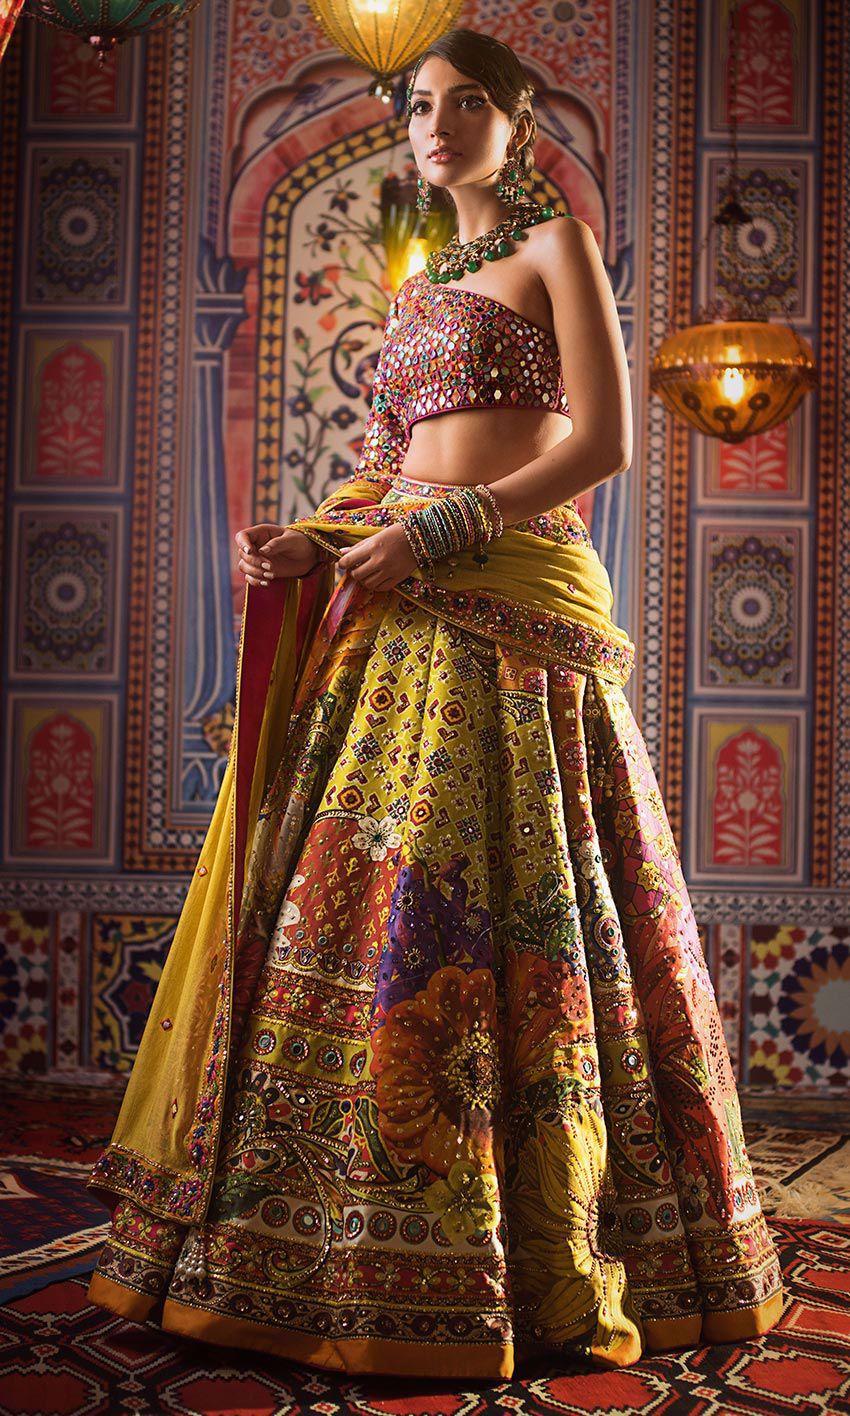 Nomi Ansari Yellow choli & Multi color lehnga bridal dress mehndi day